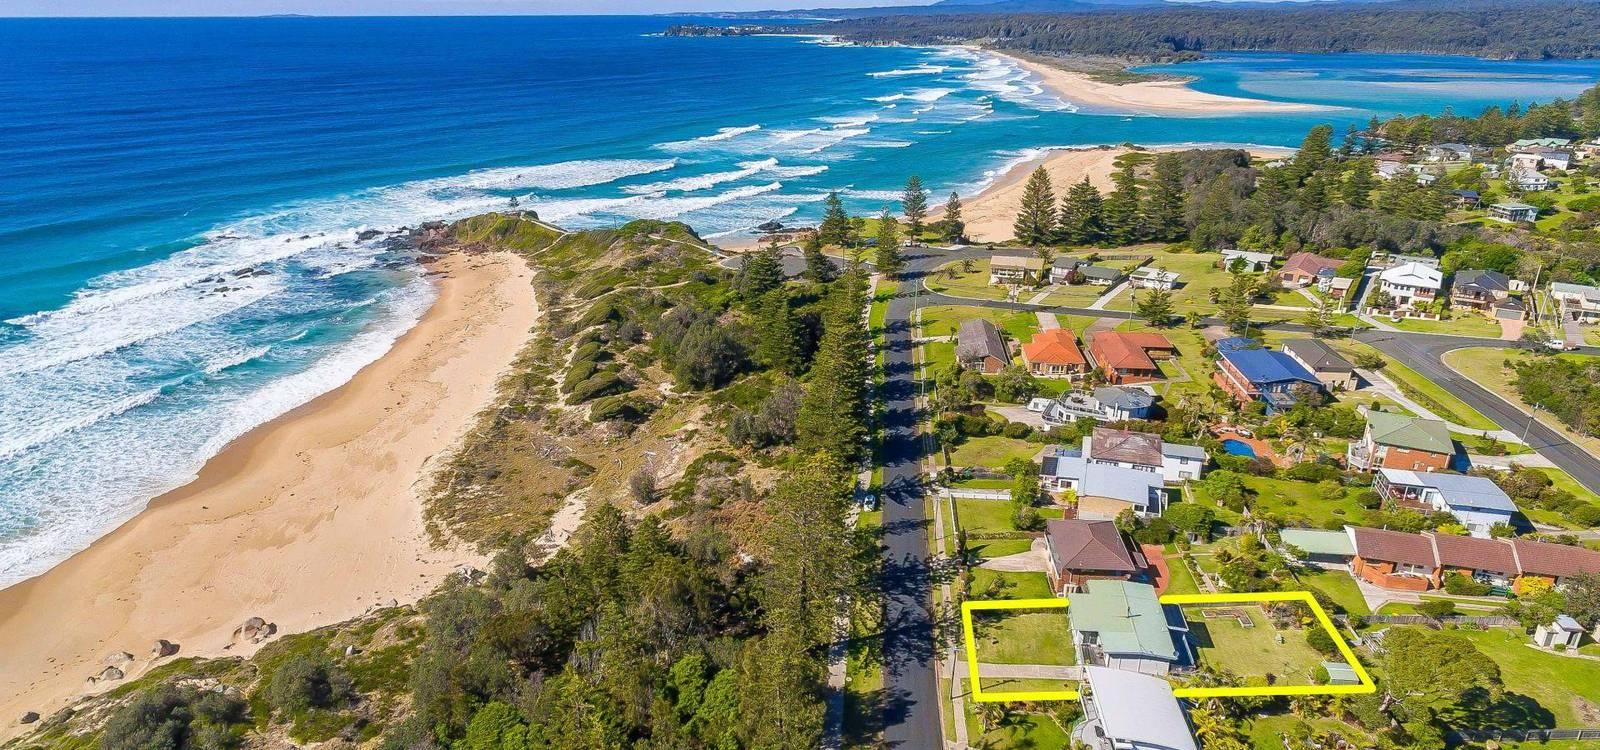 123 Tuross Boulevard TUROSS HEAD, NSW 2537 - photo 1